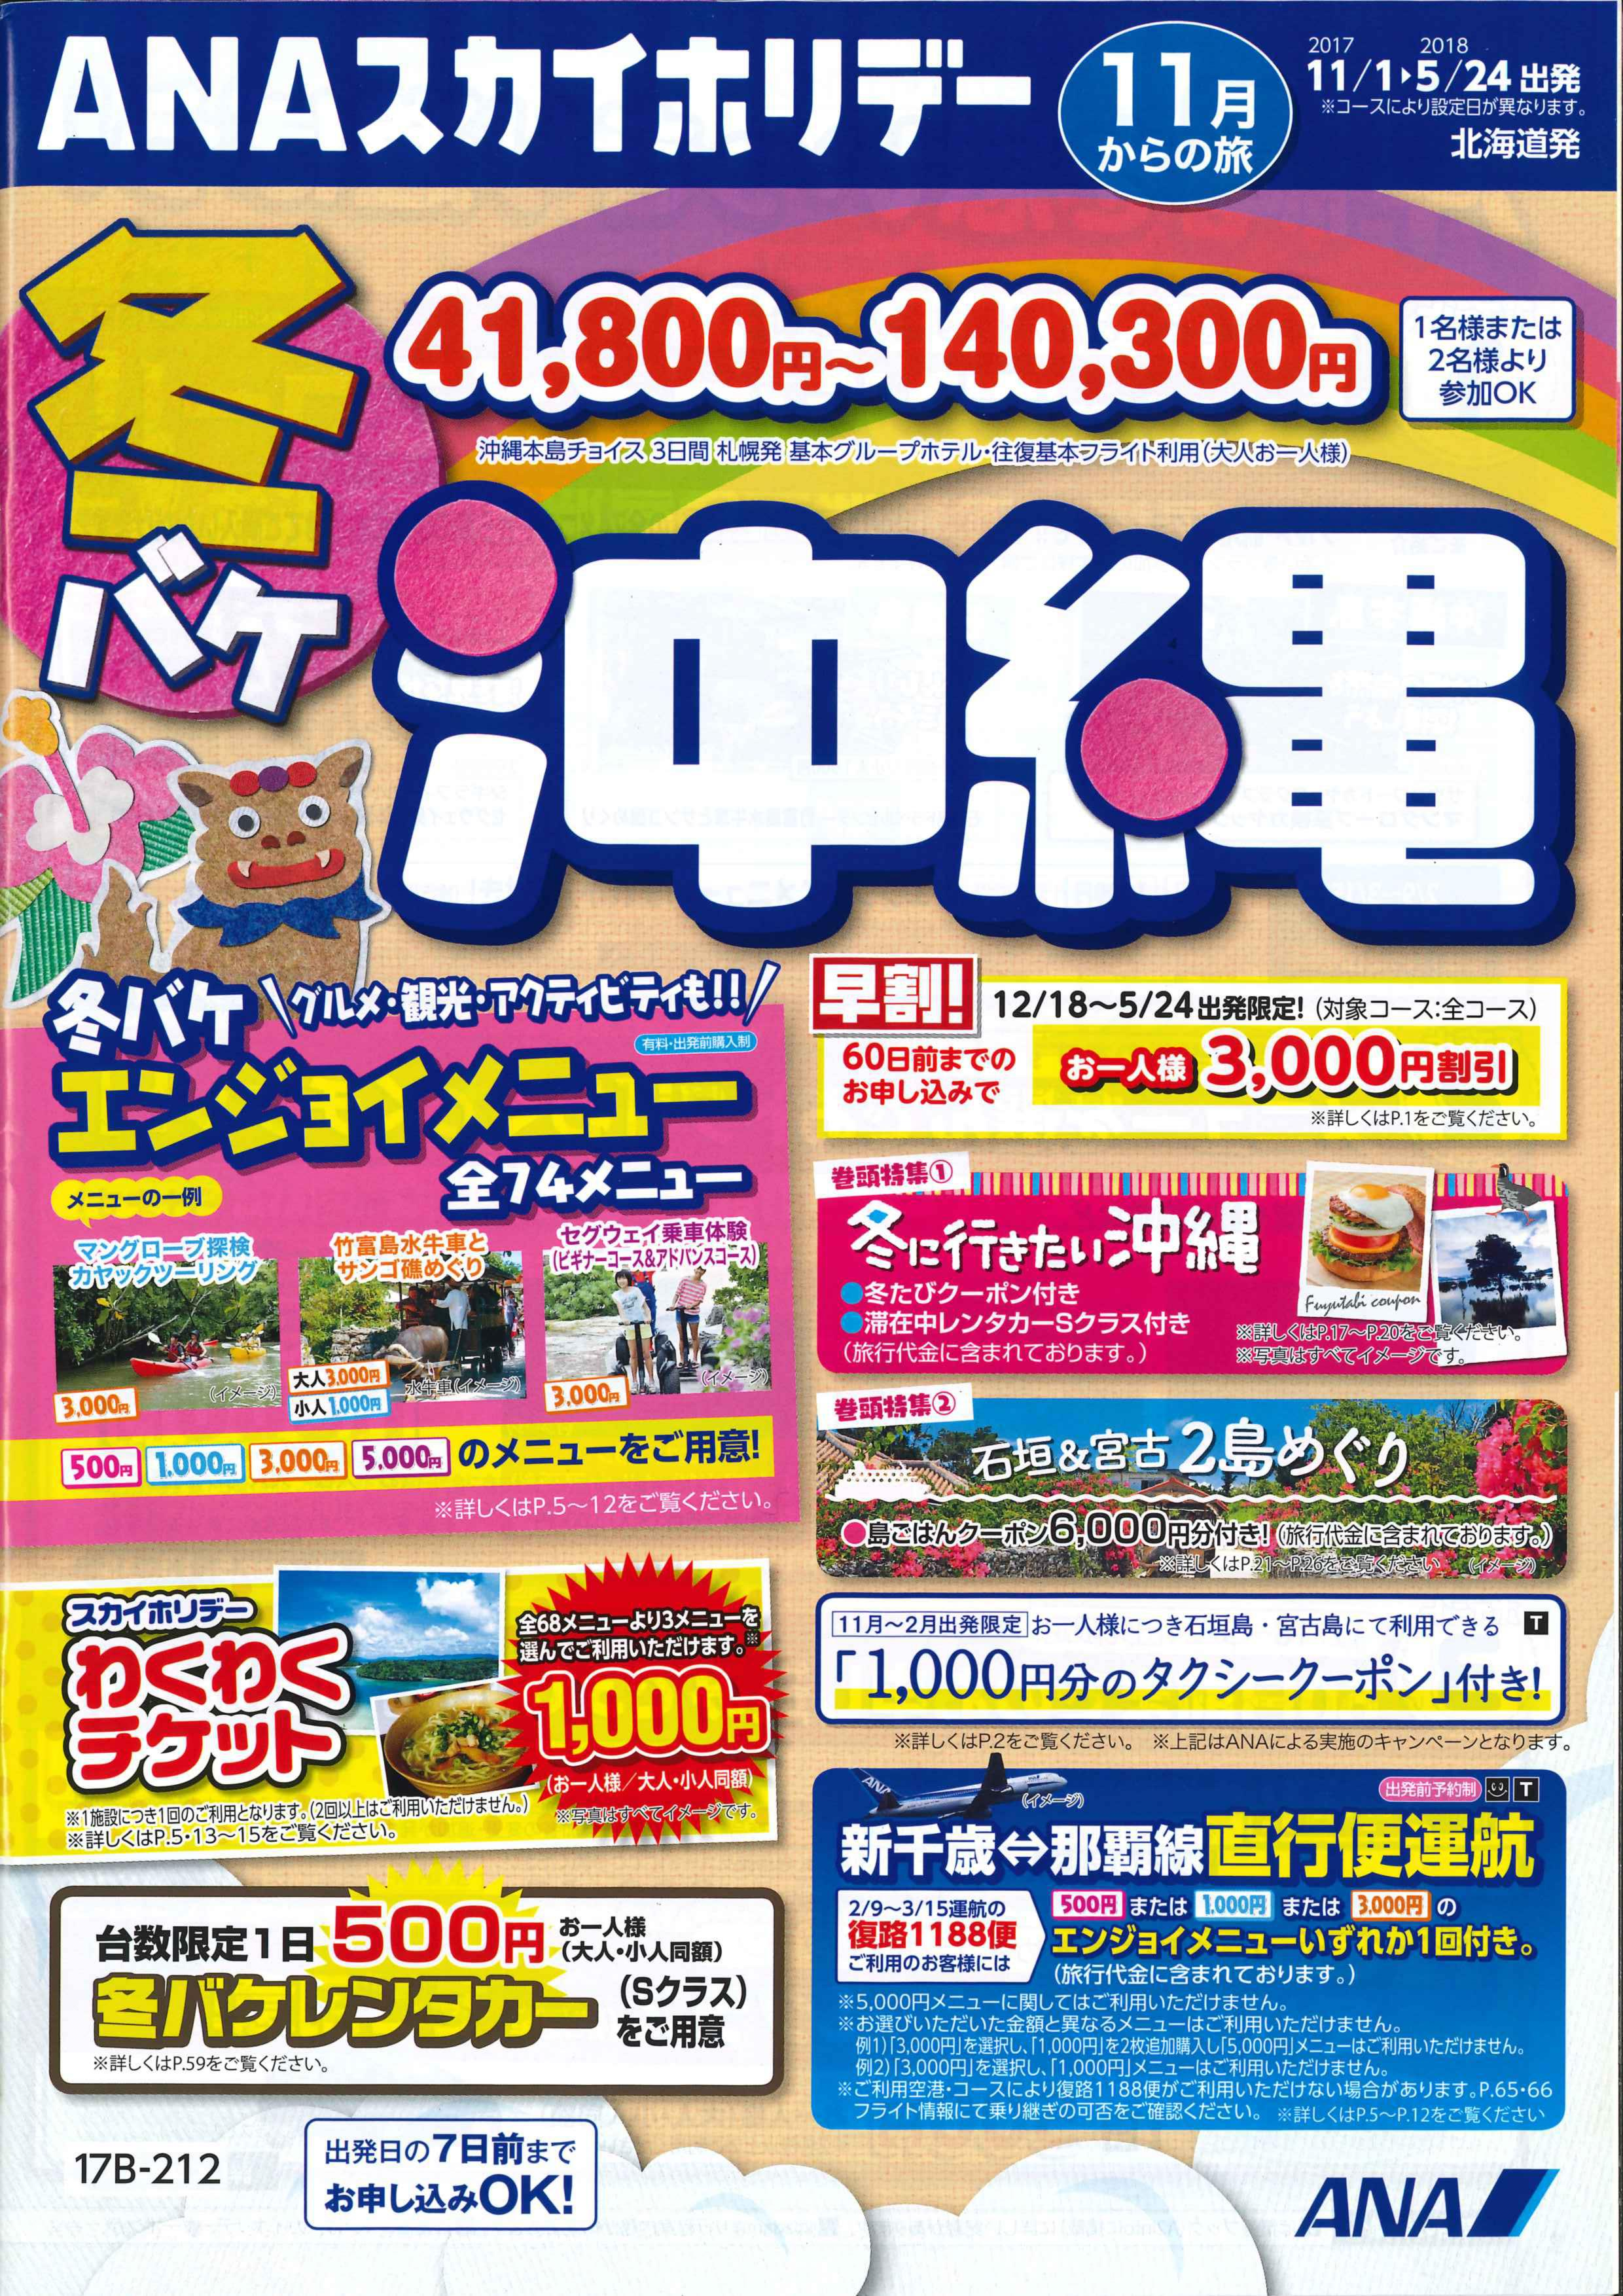 http://www.nakashibetsu-airport.jp/%E5%86%AC%E3%83%90%E3%82%B1%E3%80%80%E6%B2%96%E7%B8%84.jpg